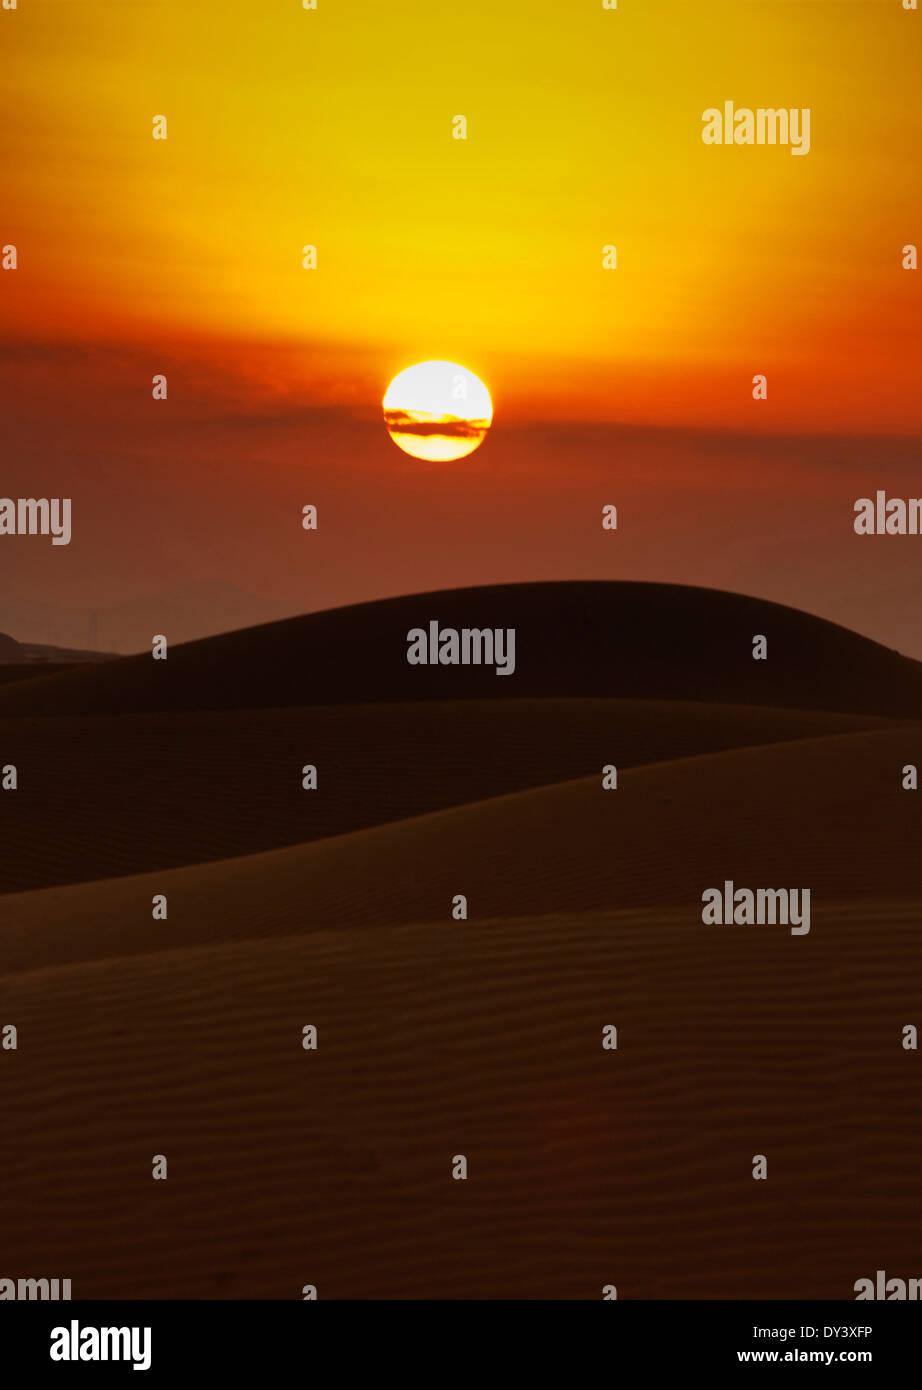 Beautiful sand dunes in Dubai desert - Stock Image